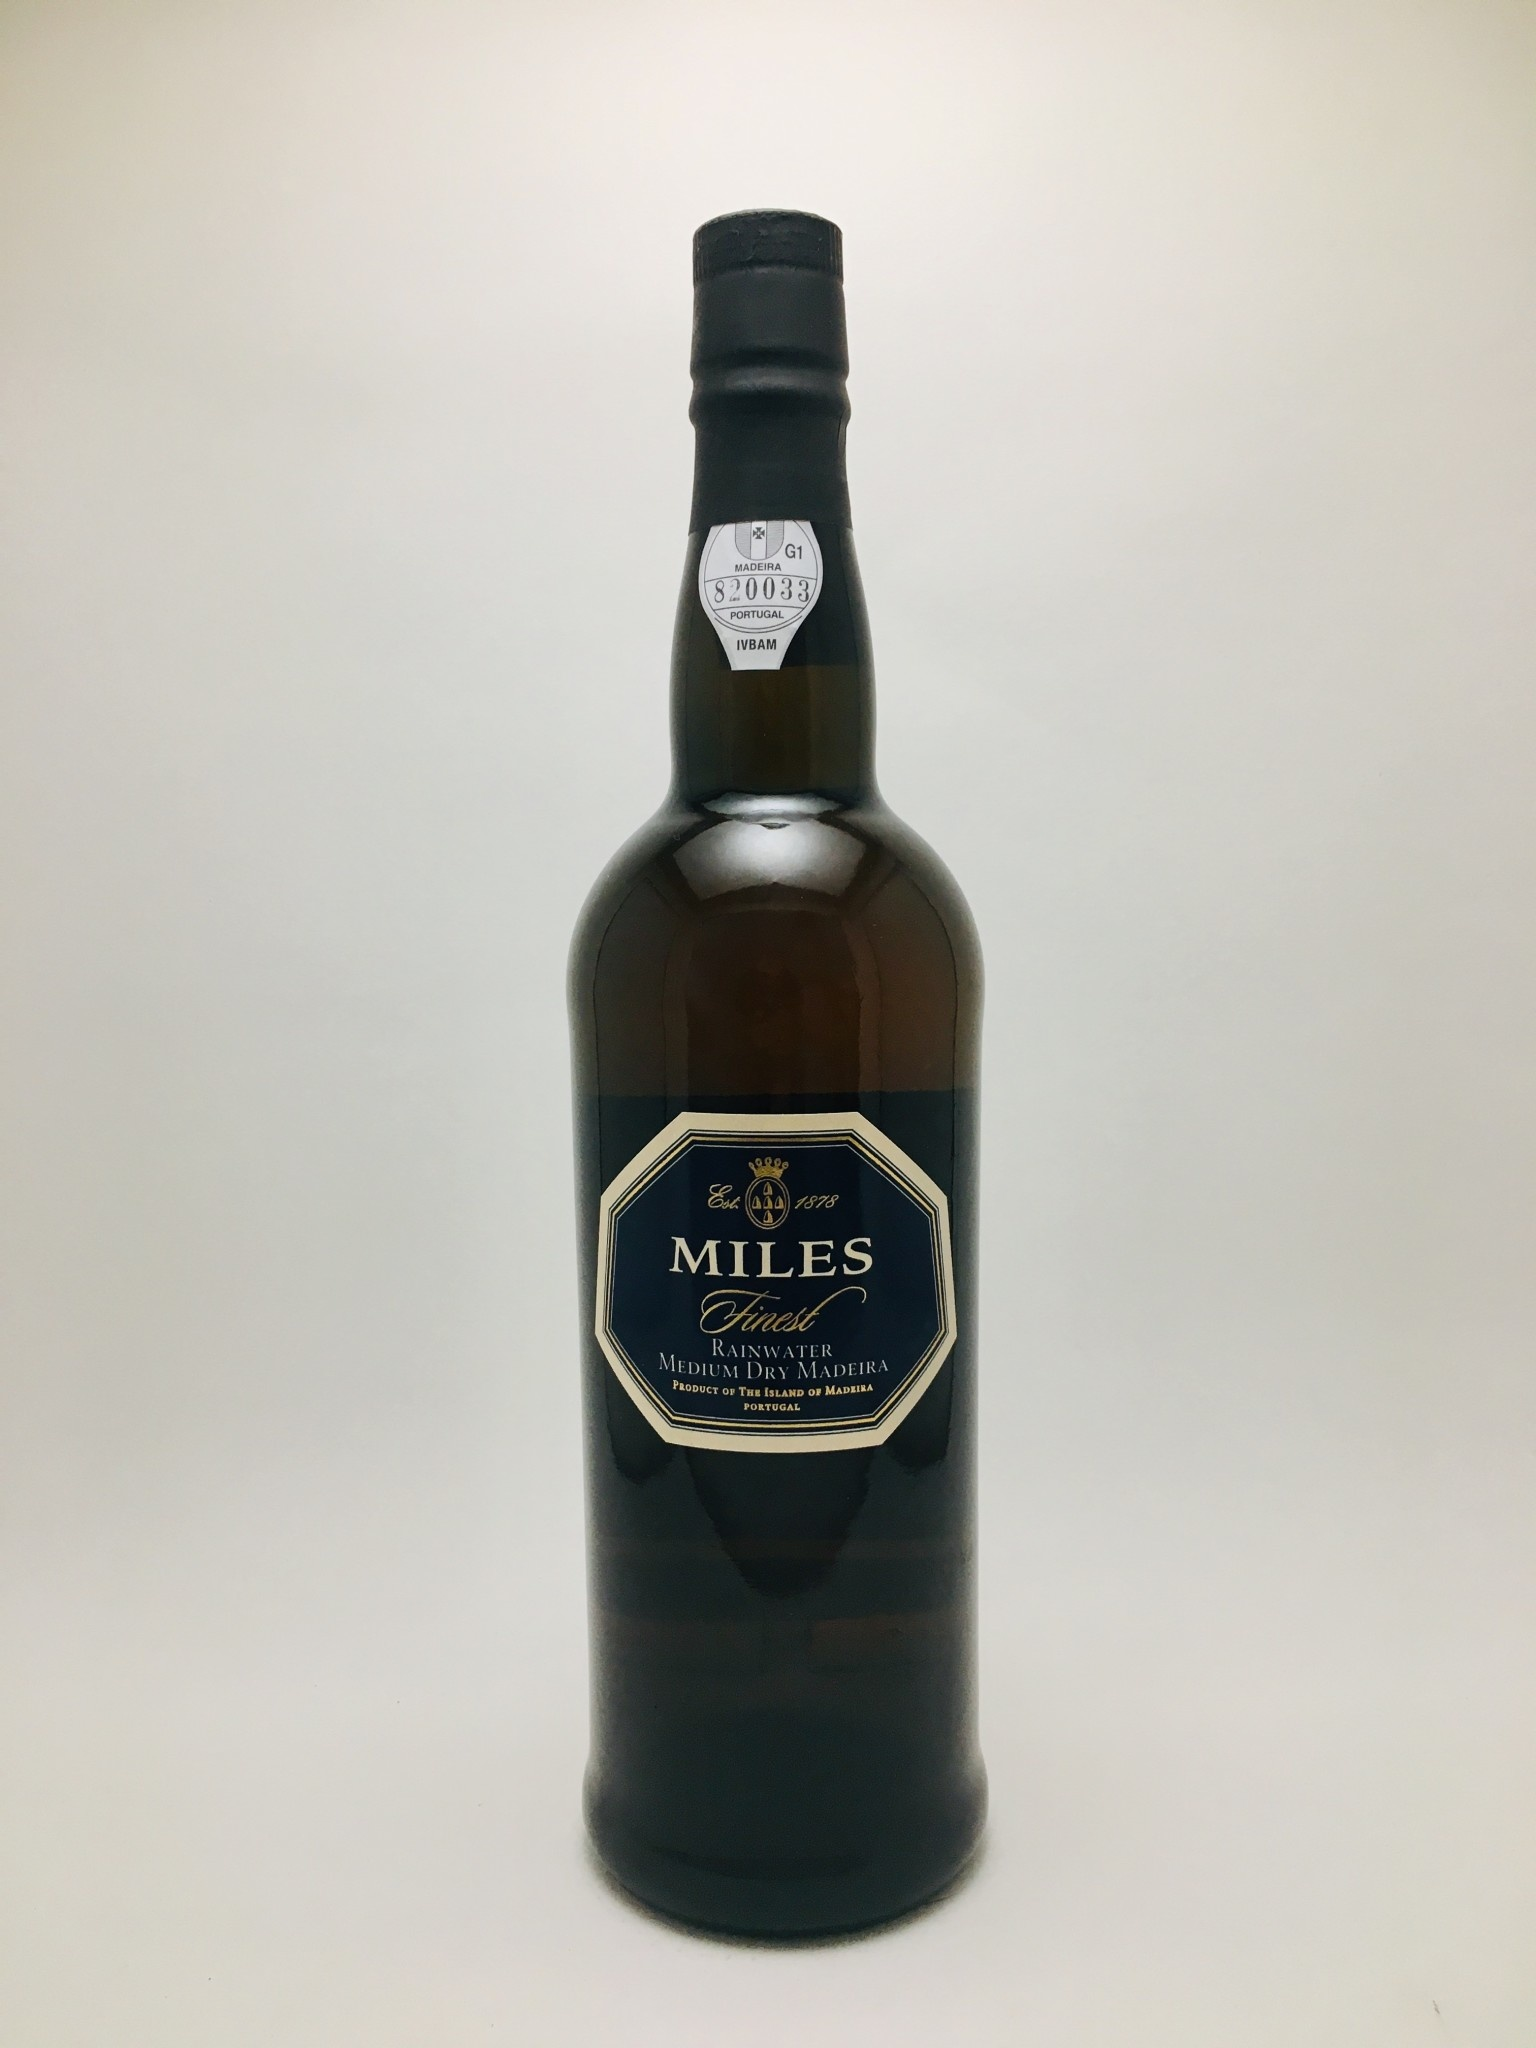 Miles Rainwater Medium Dry Madeira Portugal NV